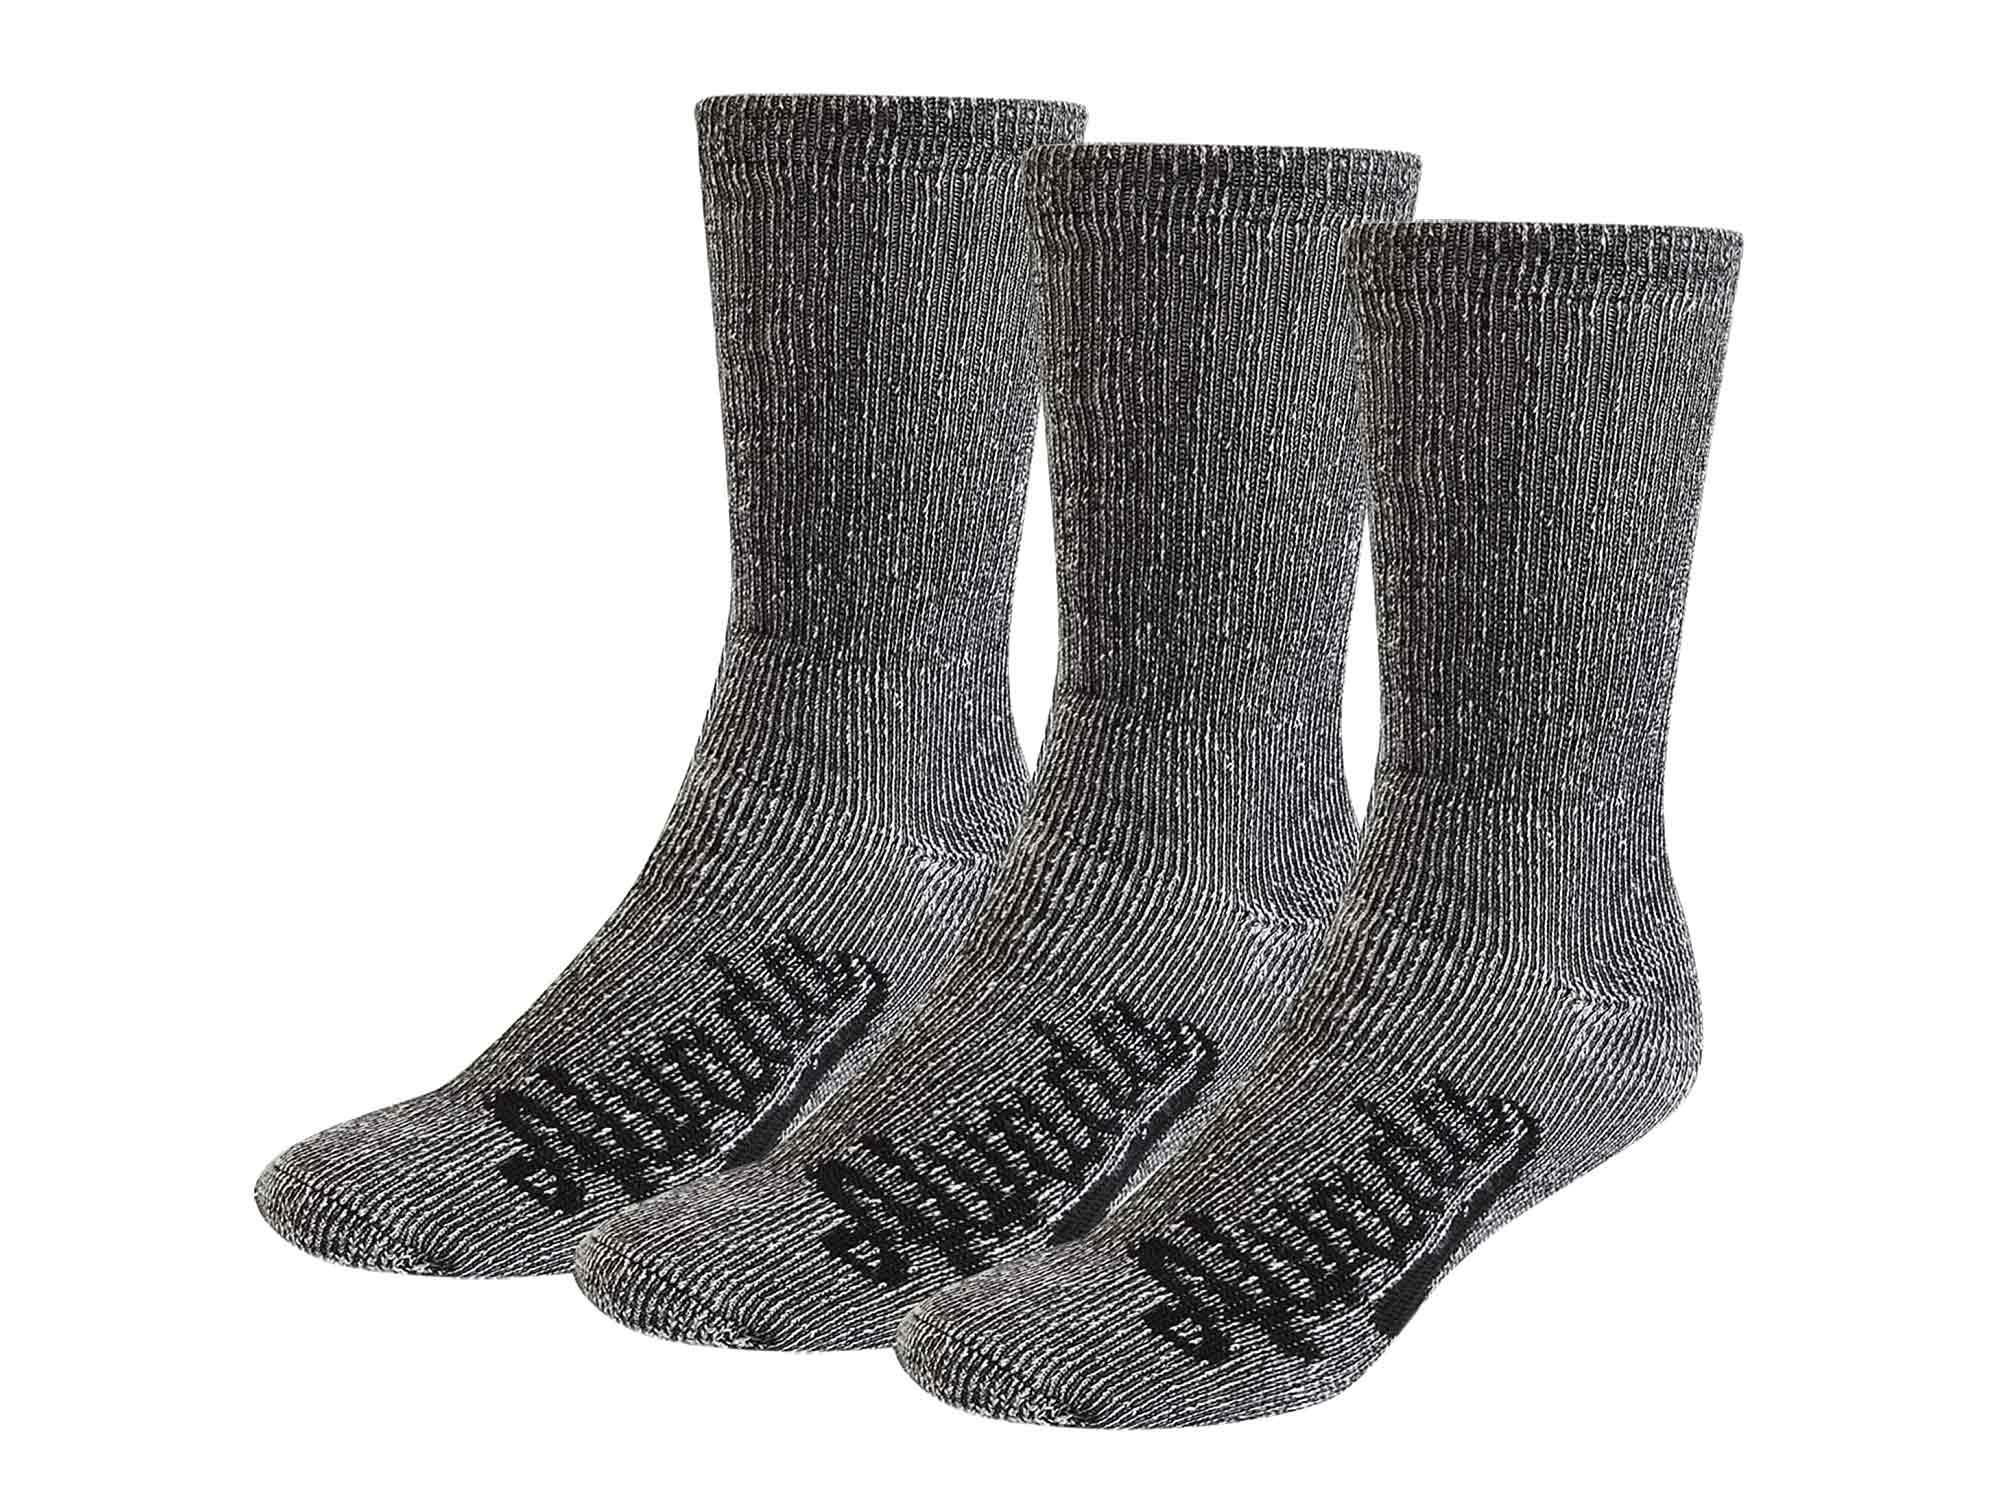 Alvada 80% Merino Wool Hiking Socks Thermal Warm Crew Winter Boot Sock for Men & Women 3 Pairs